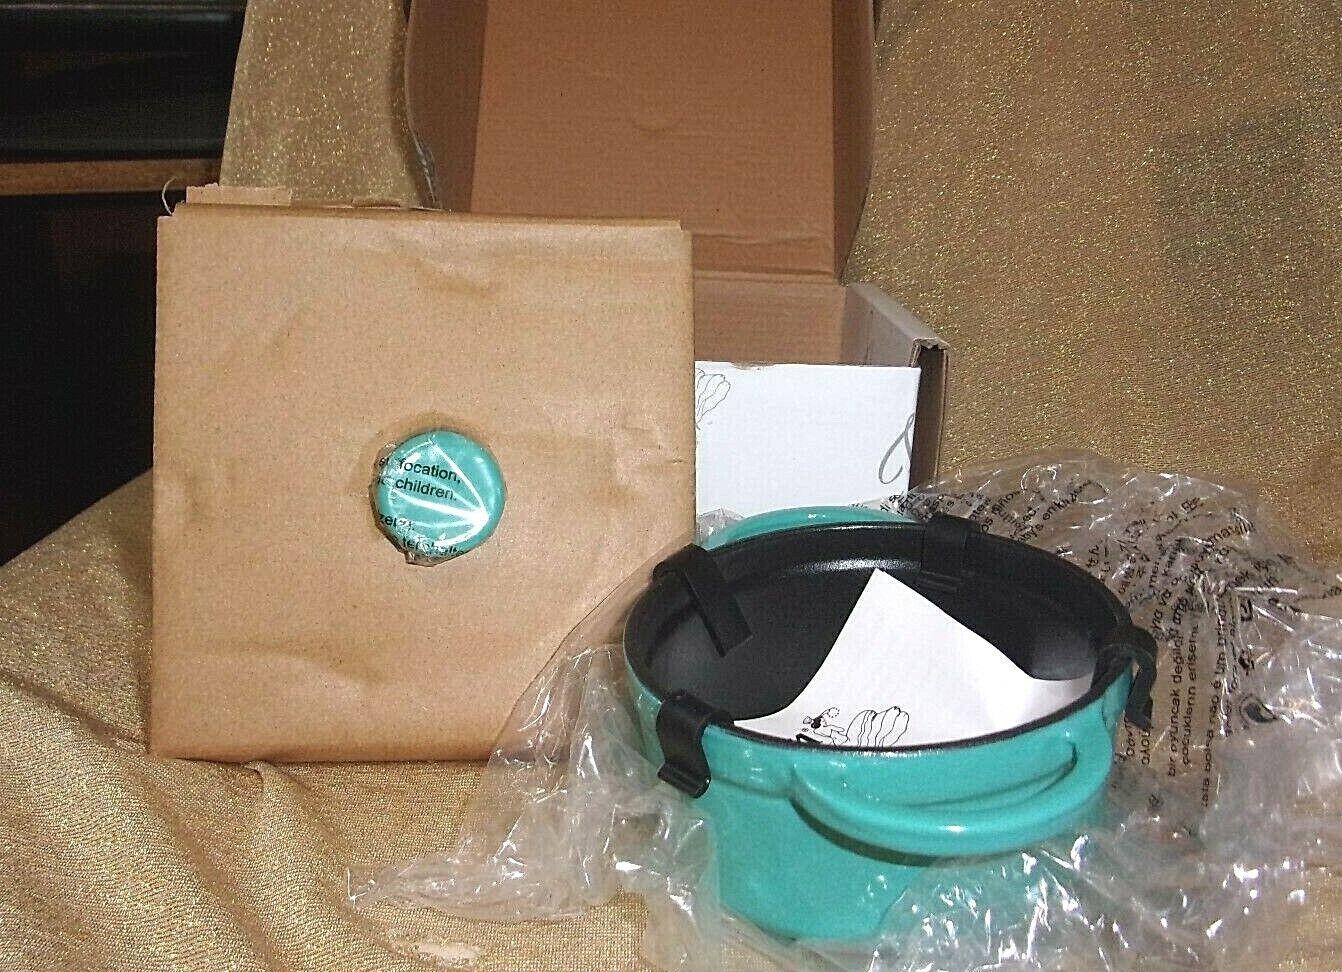 NIB FiestaWare Turquoise Cast Iron Mini Casserole/Lid Dutch